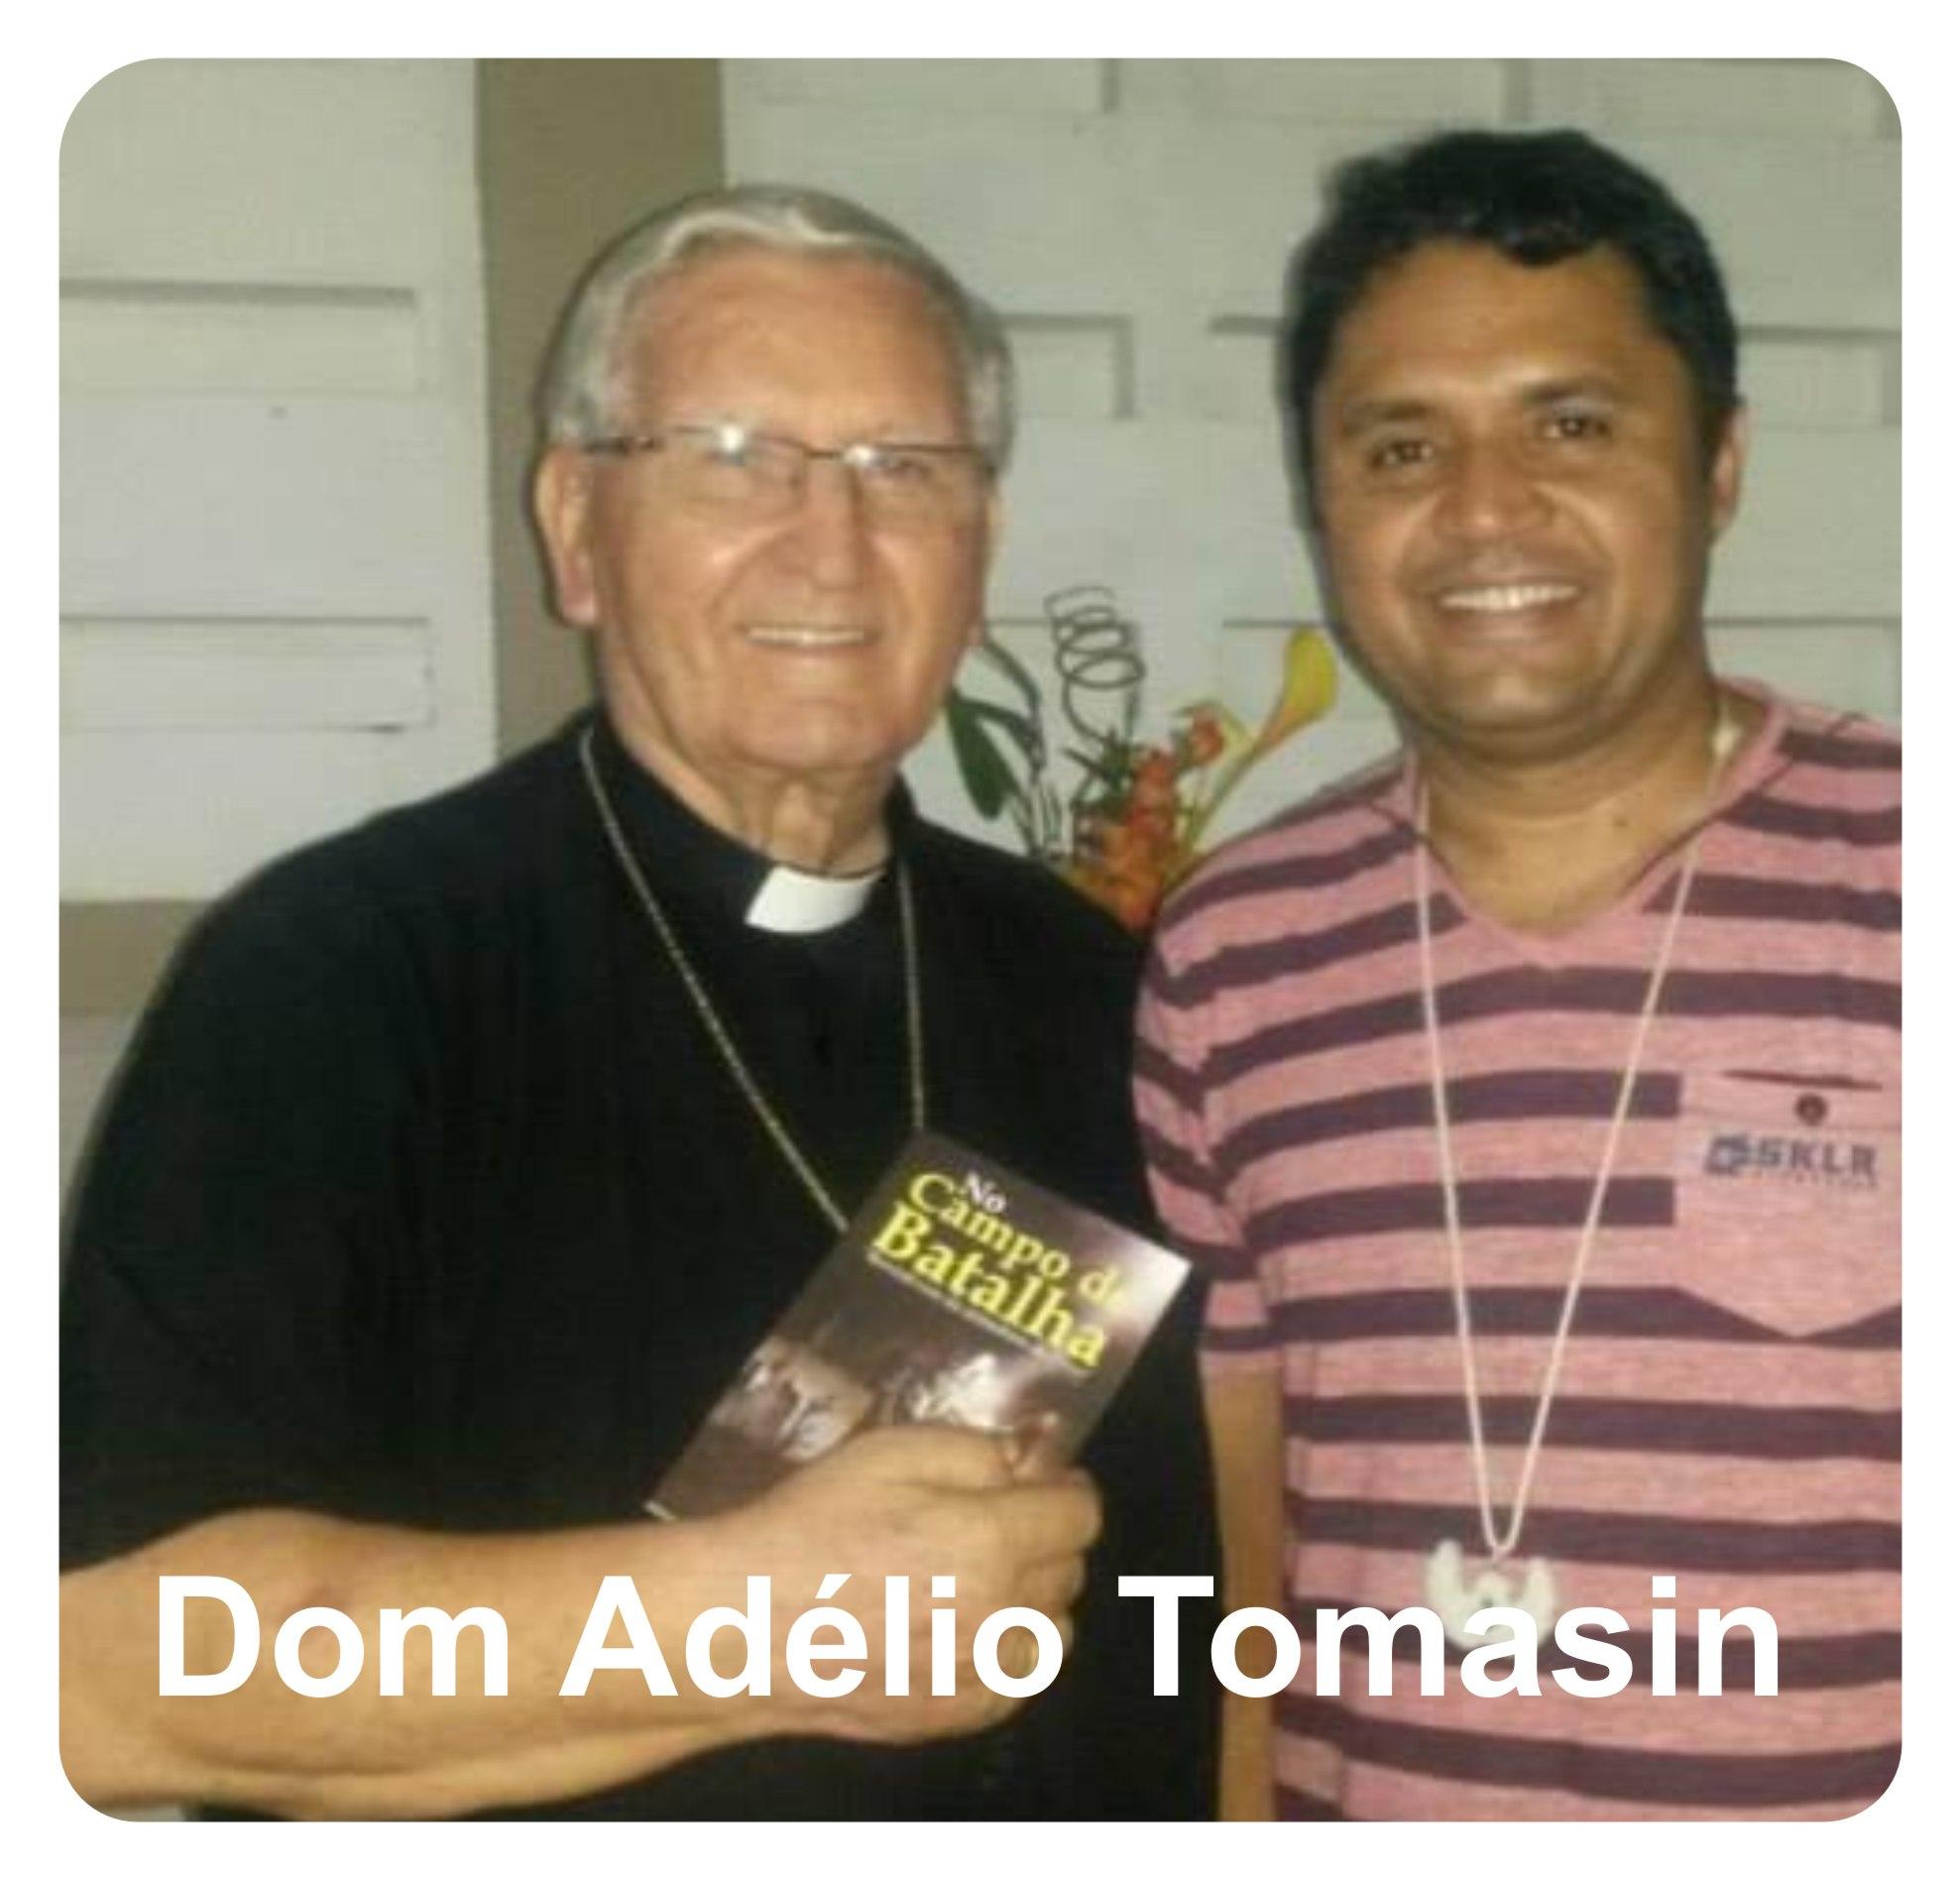 Dom Adélio Tomasin